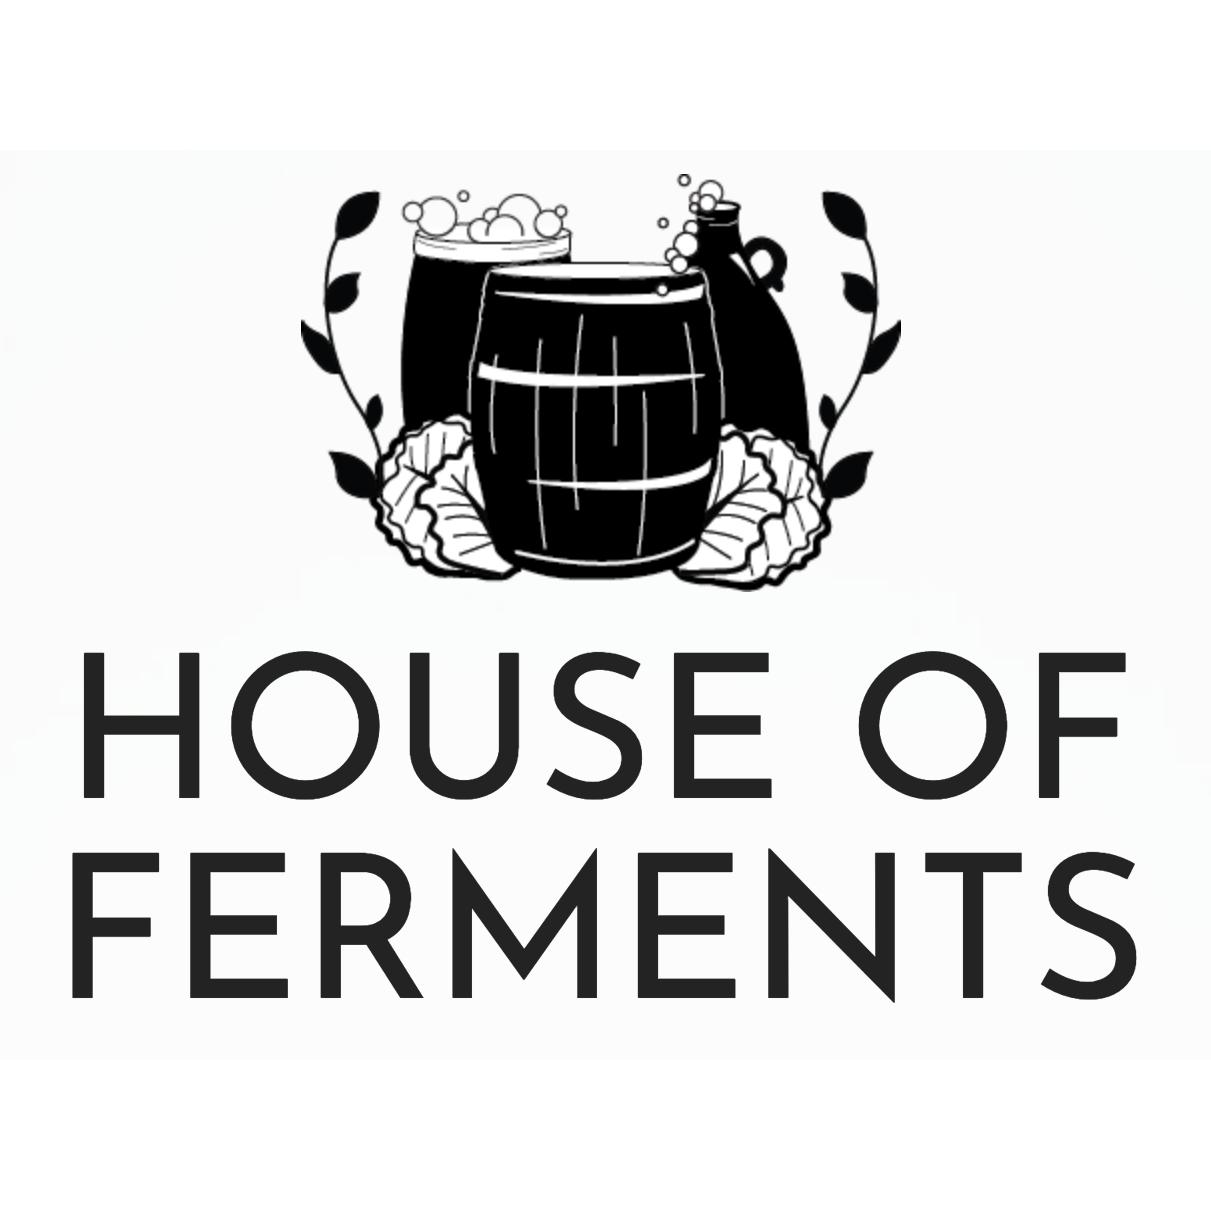 House of Ferments